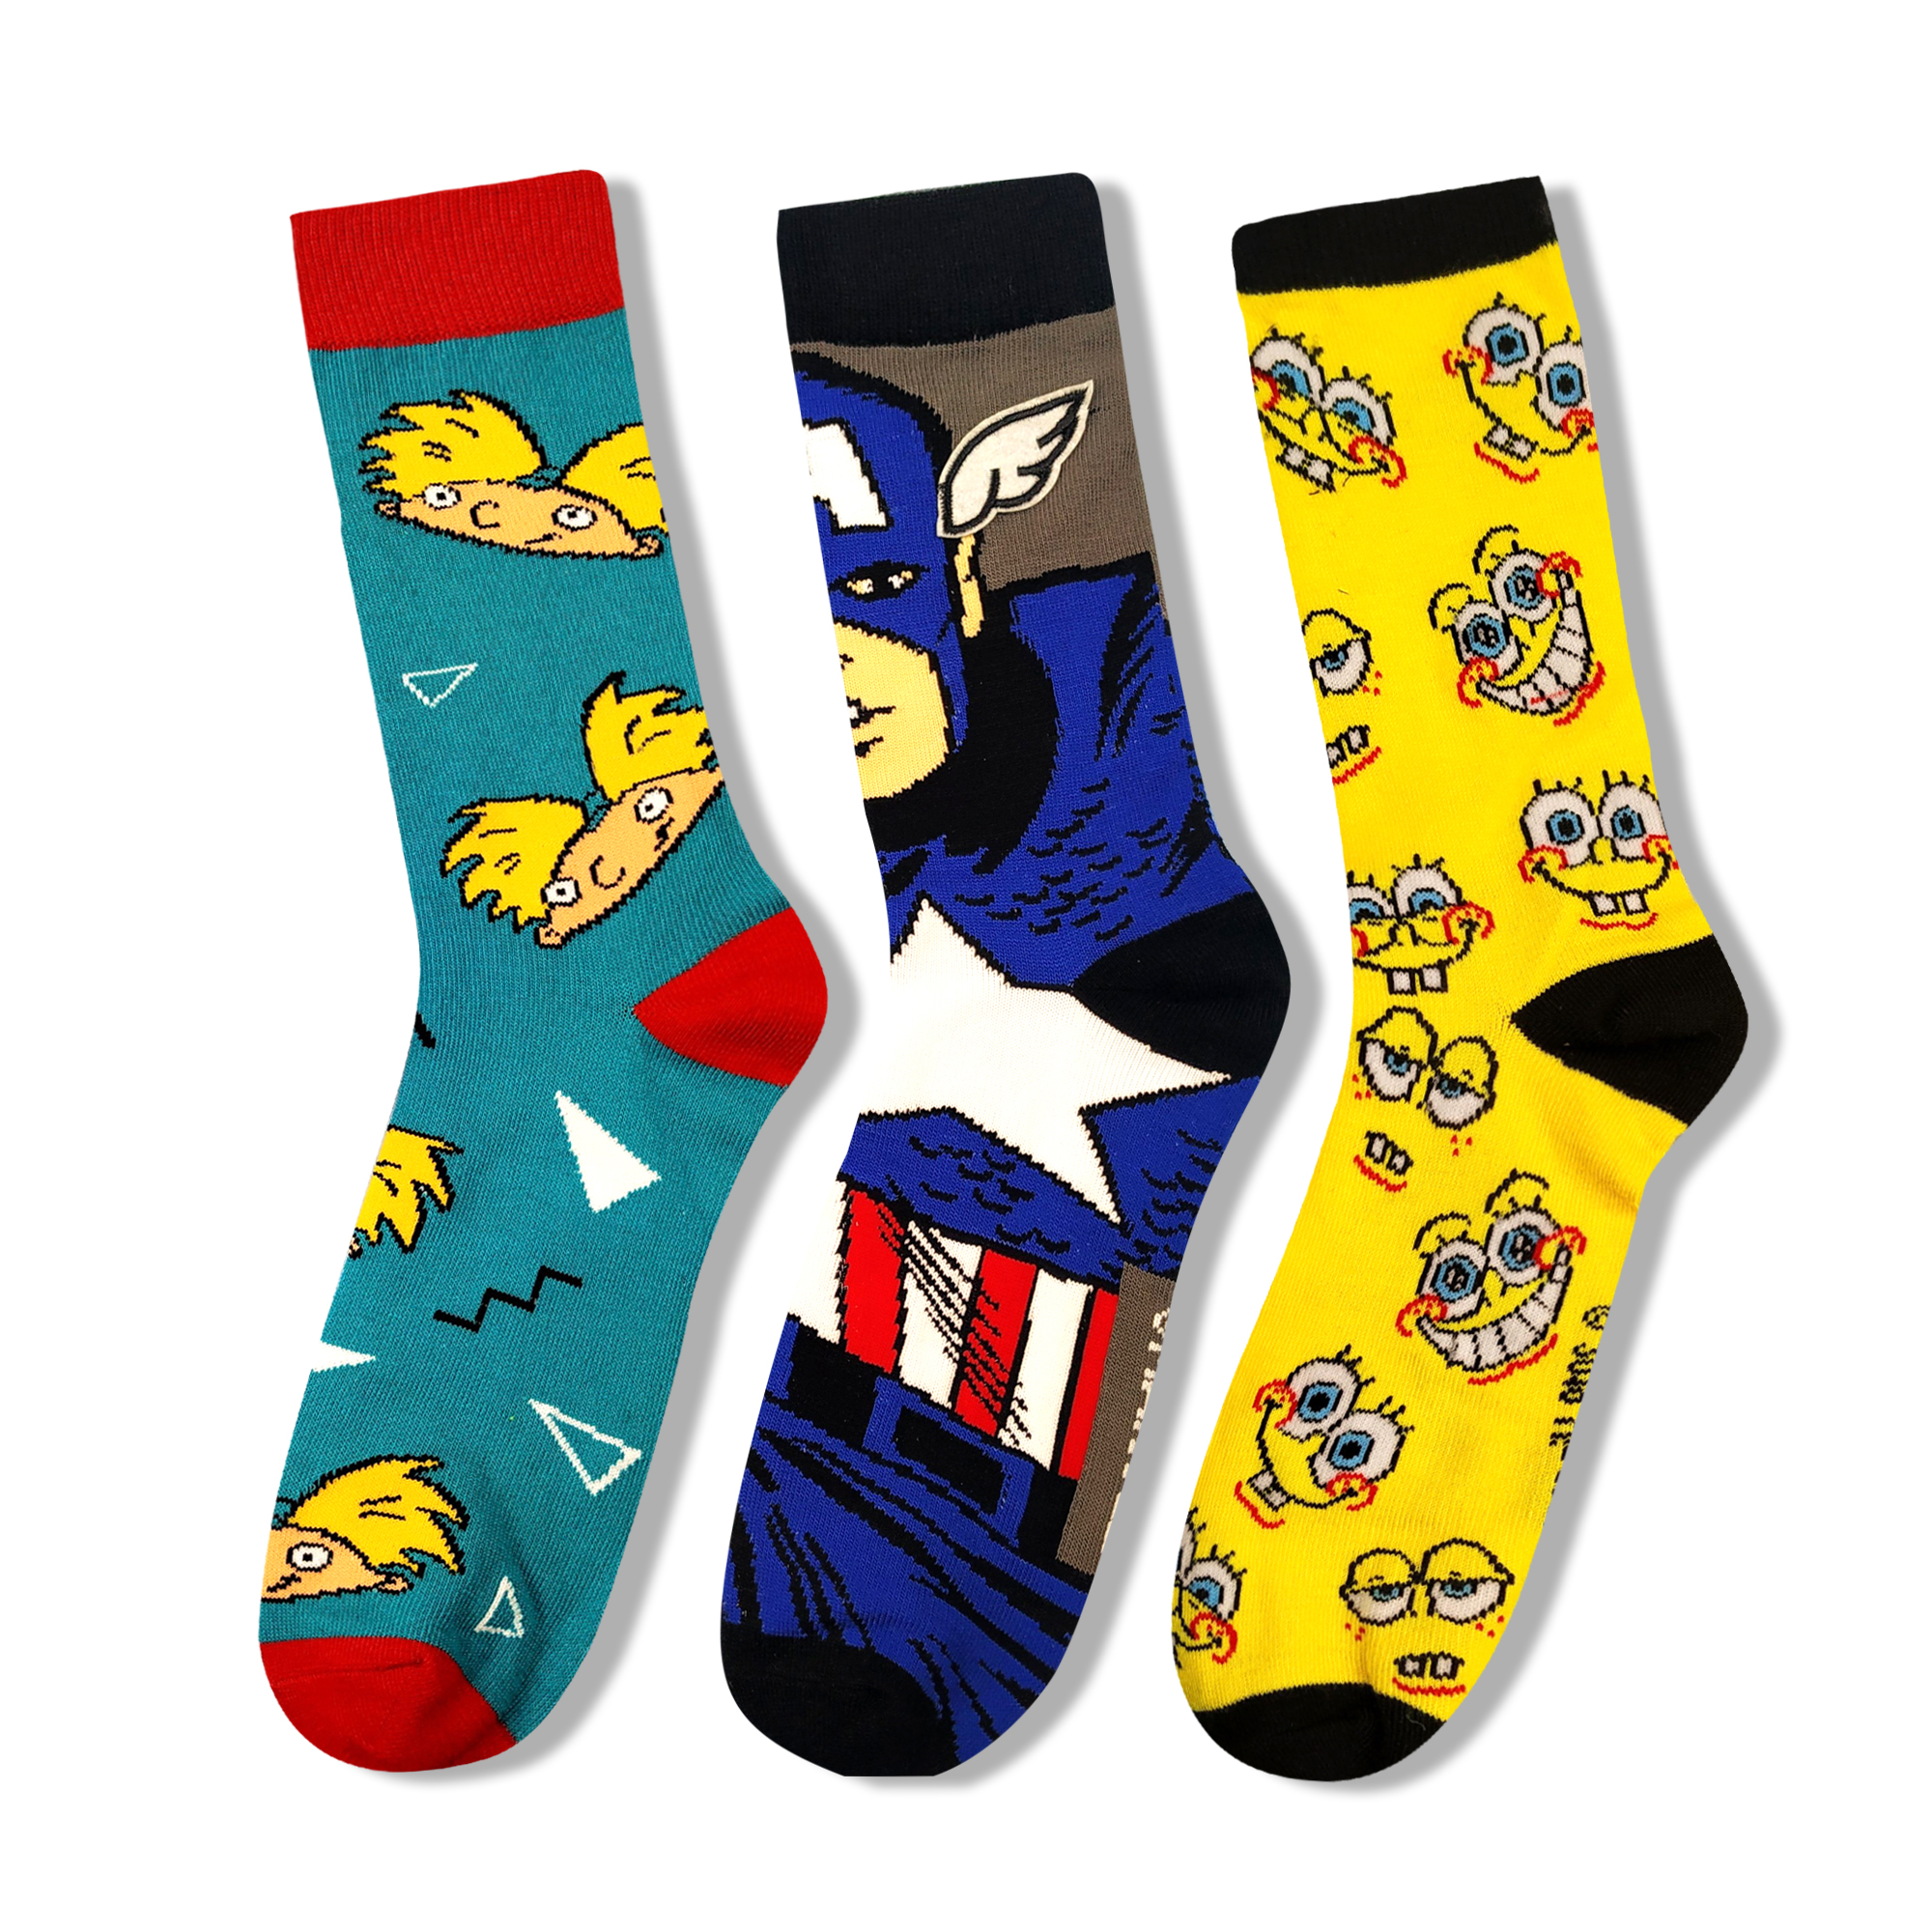 Colorful Anime Cartoon Print Funny Dress Socks Personalized Novelty Men Women Happy Sock Cotton Warm Blue Yellow Long Sock Men